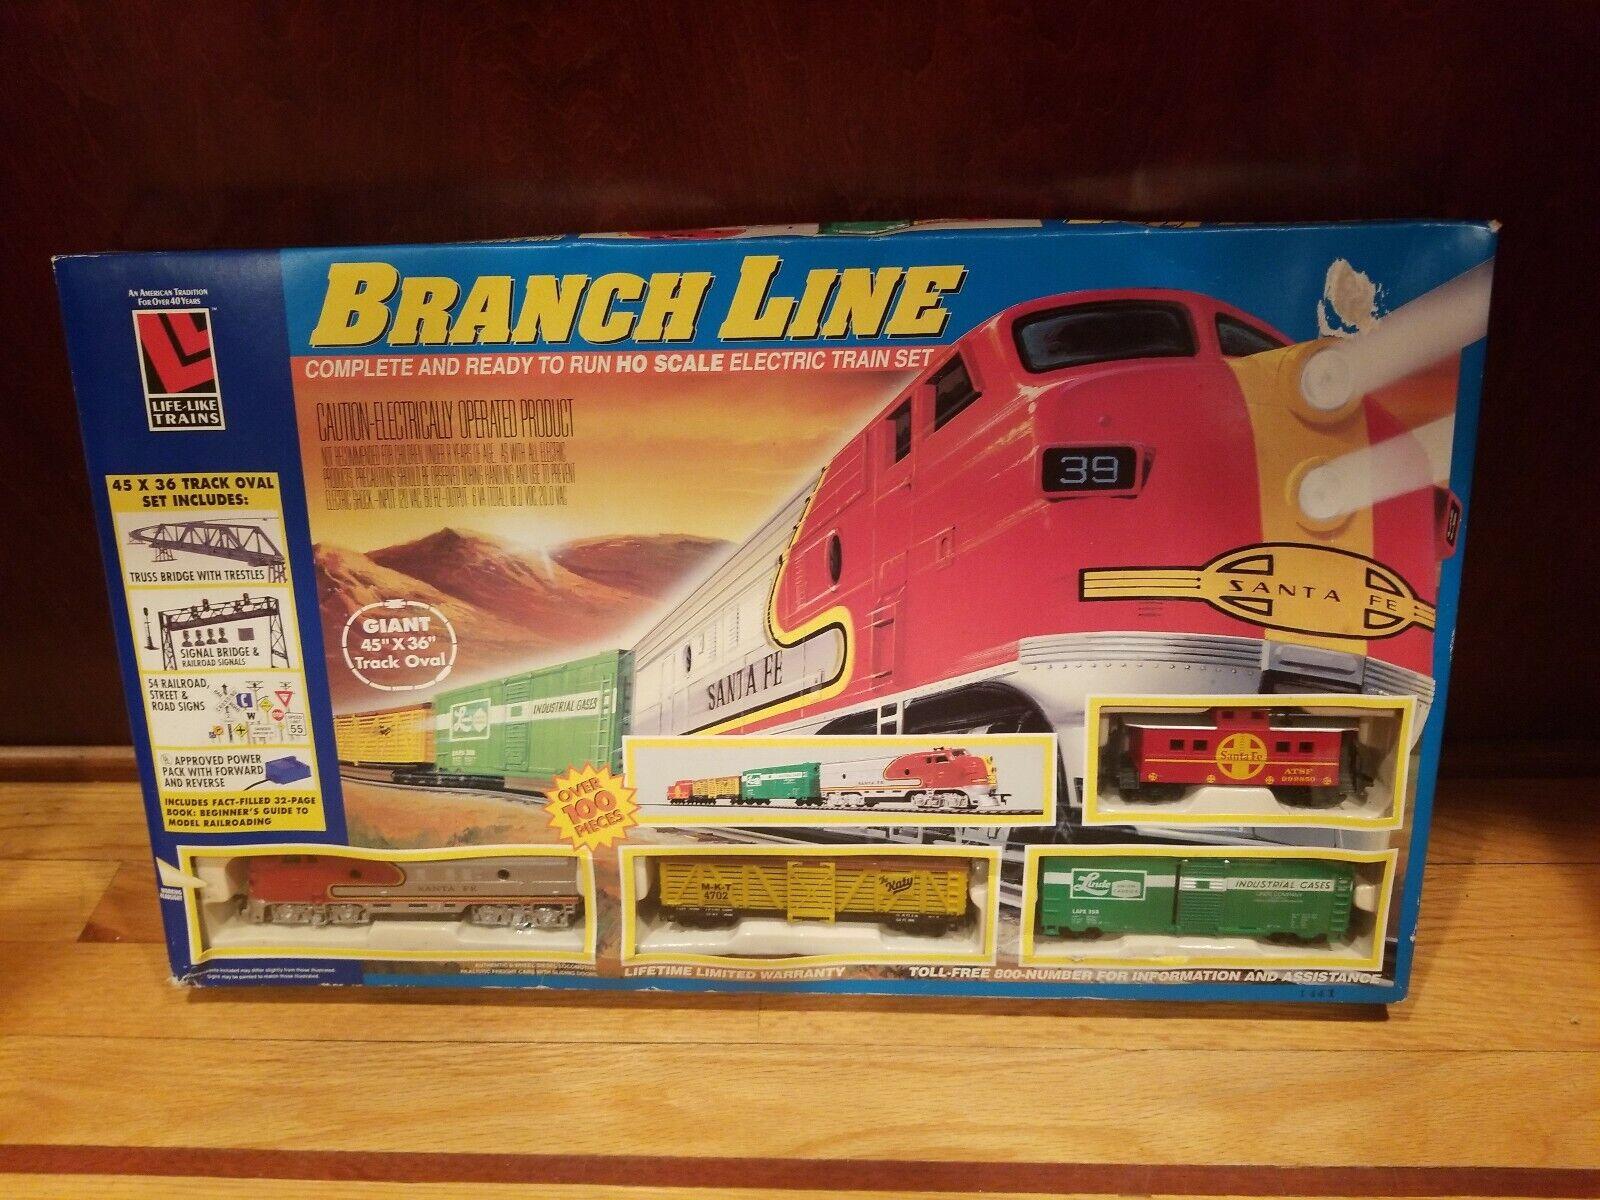 Life-Like Trains BRANCH LINE HO Scale SANTA FE Complete & Ready to Run Train Set